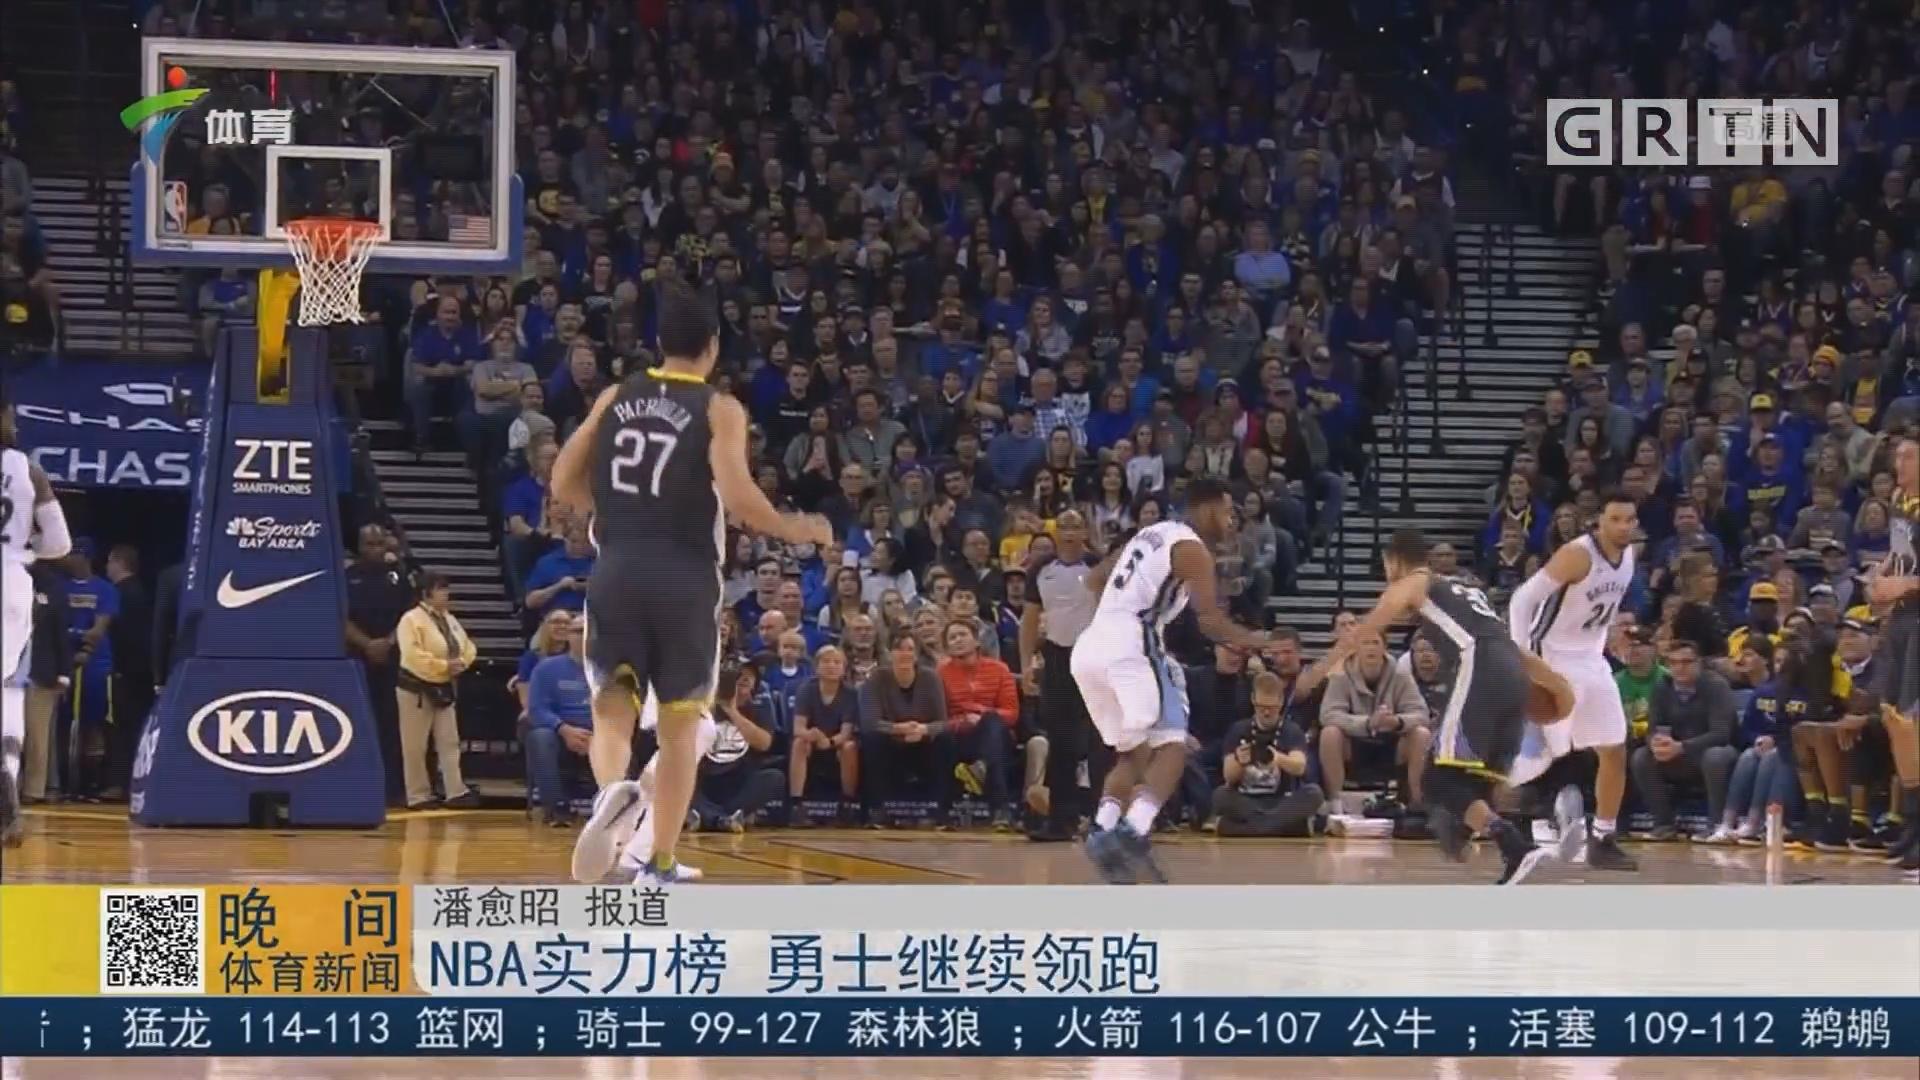 NBA实力榜 勇士继续领跑